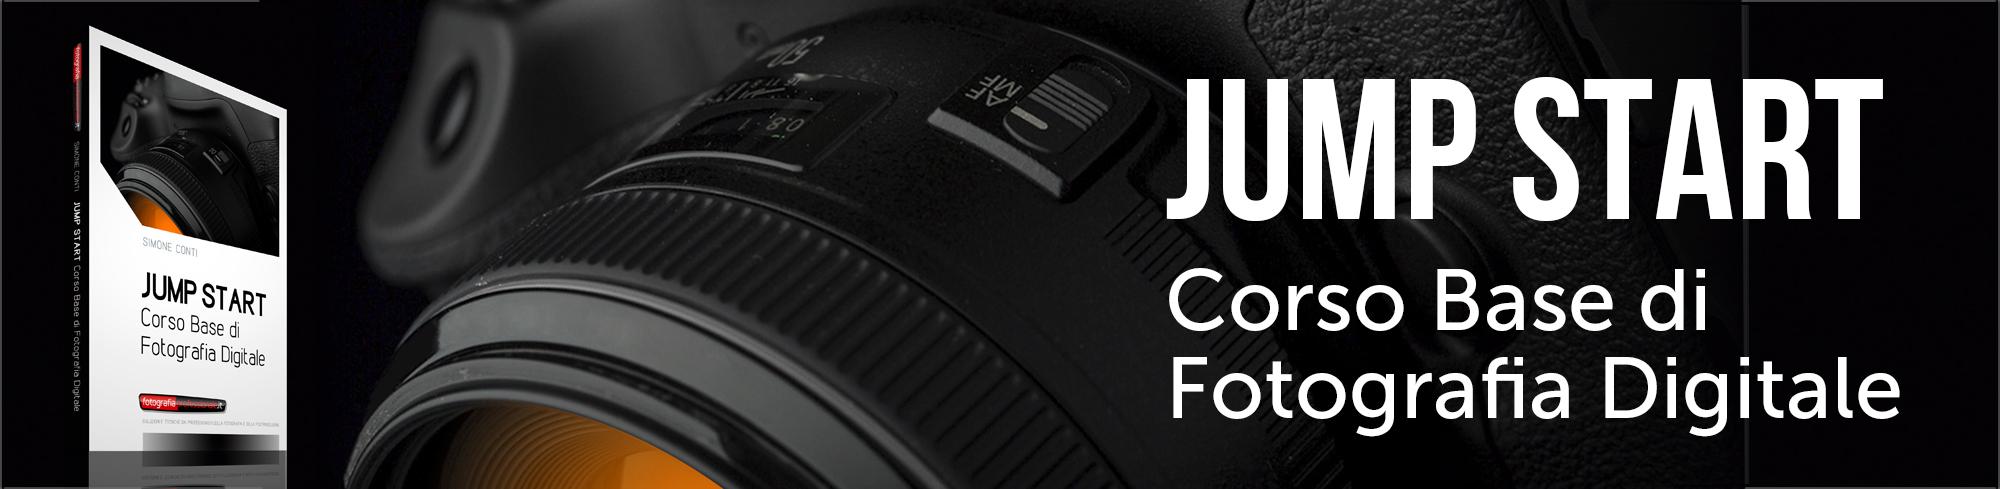 """Jump Start"" - Video-corso di Fotografia Digitale Base di FotografiaProfessionale.it"